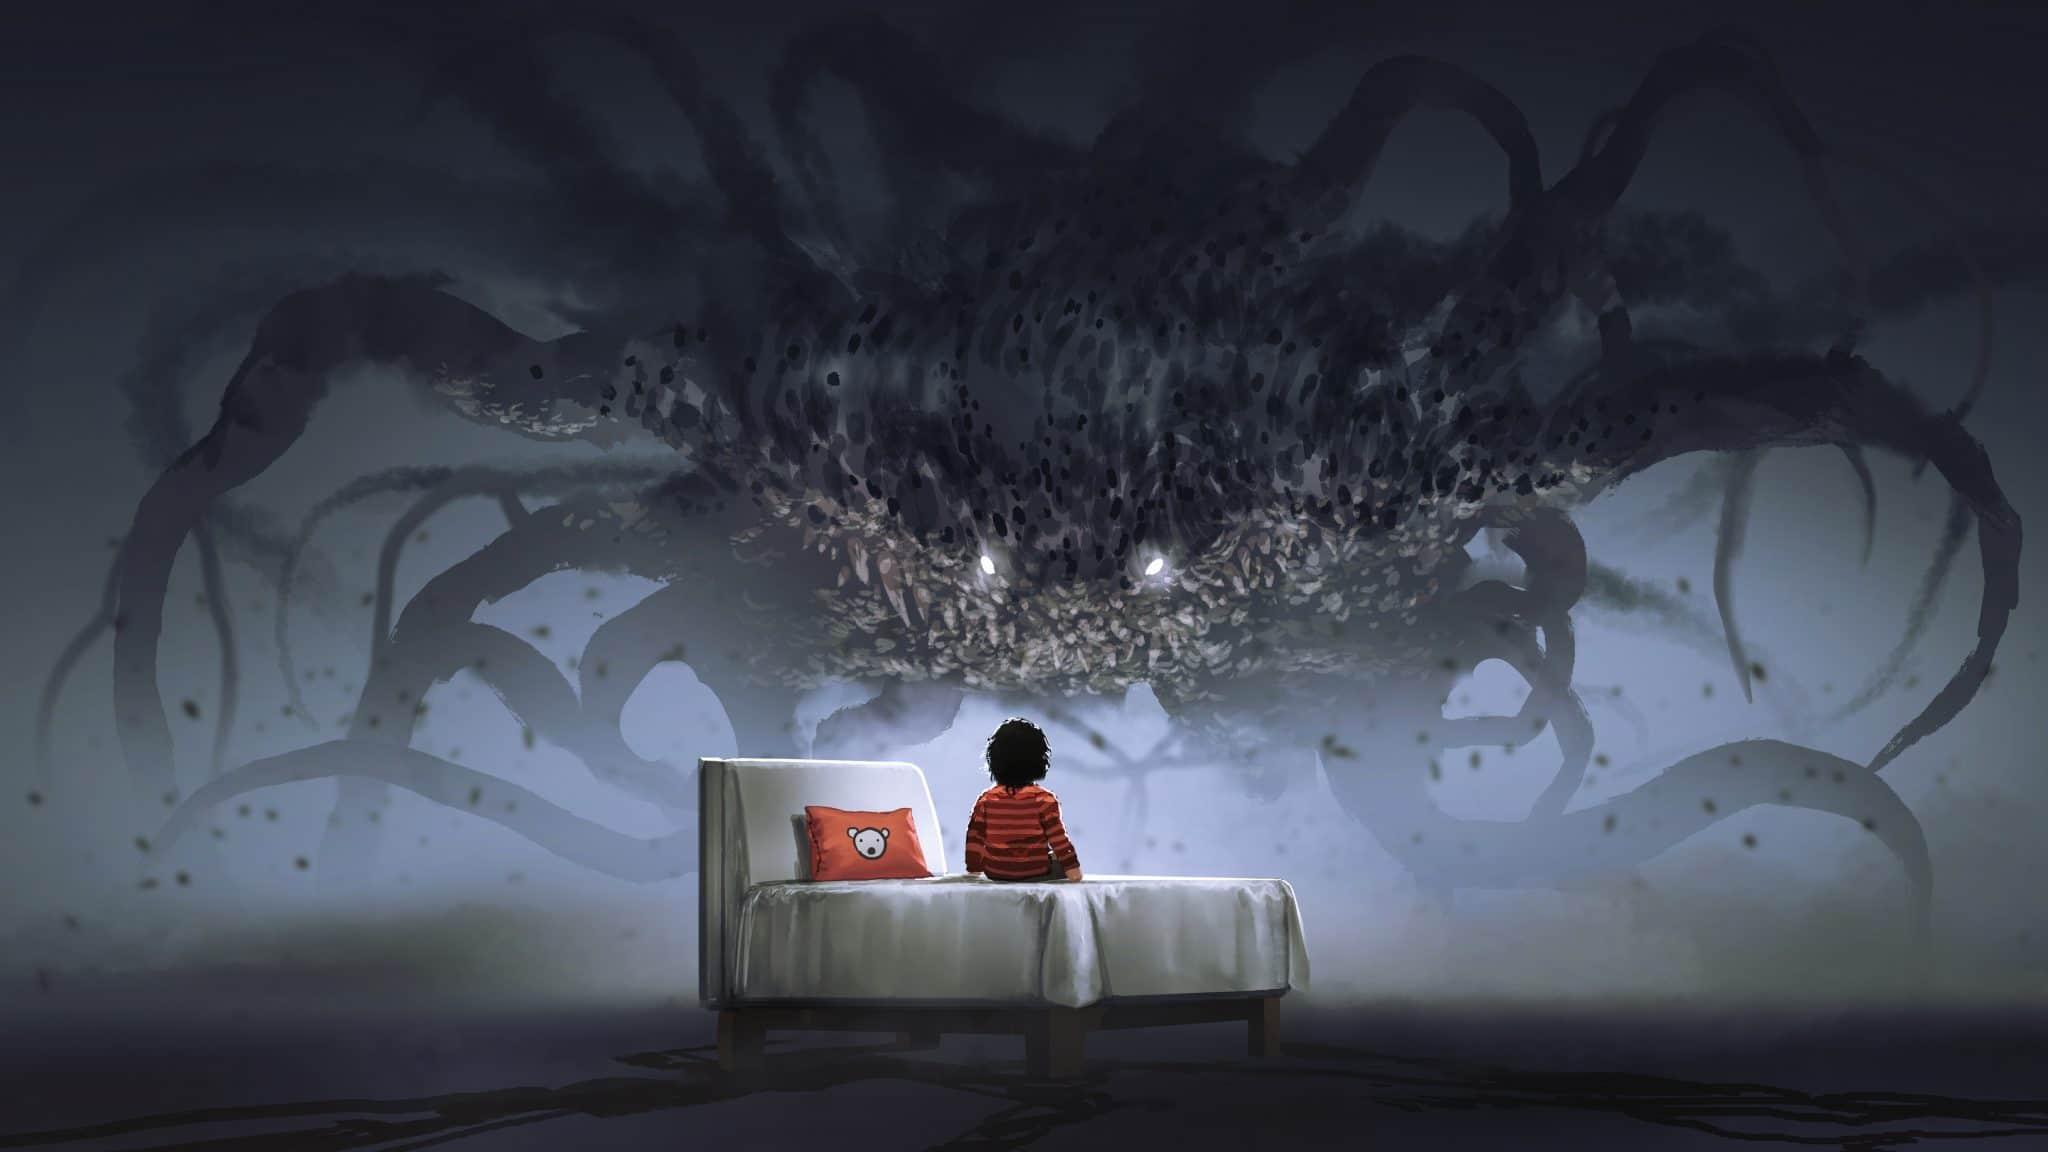 Traumdeutung Alptraum